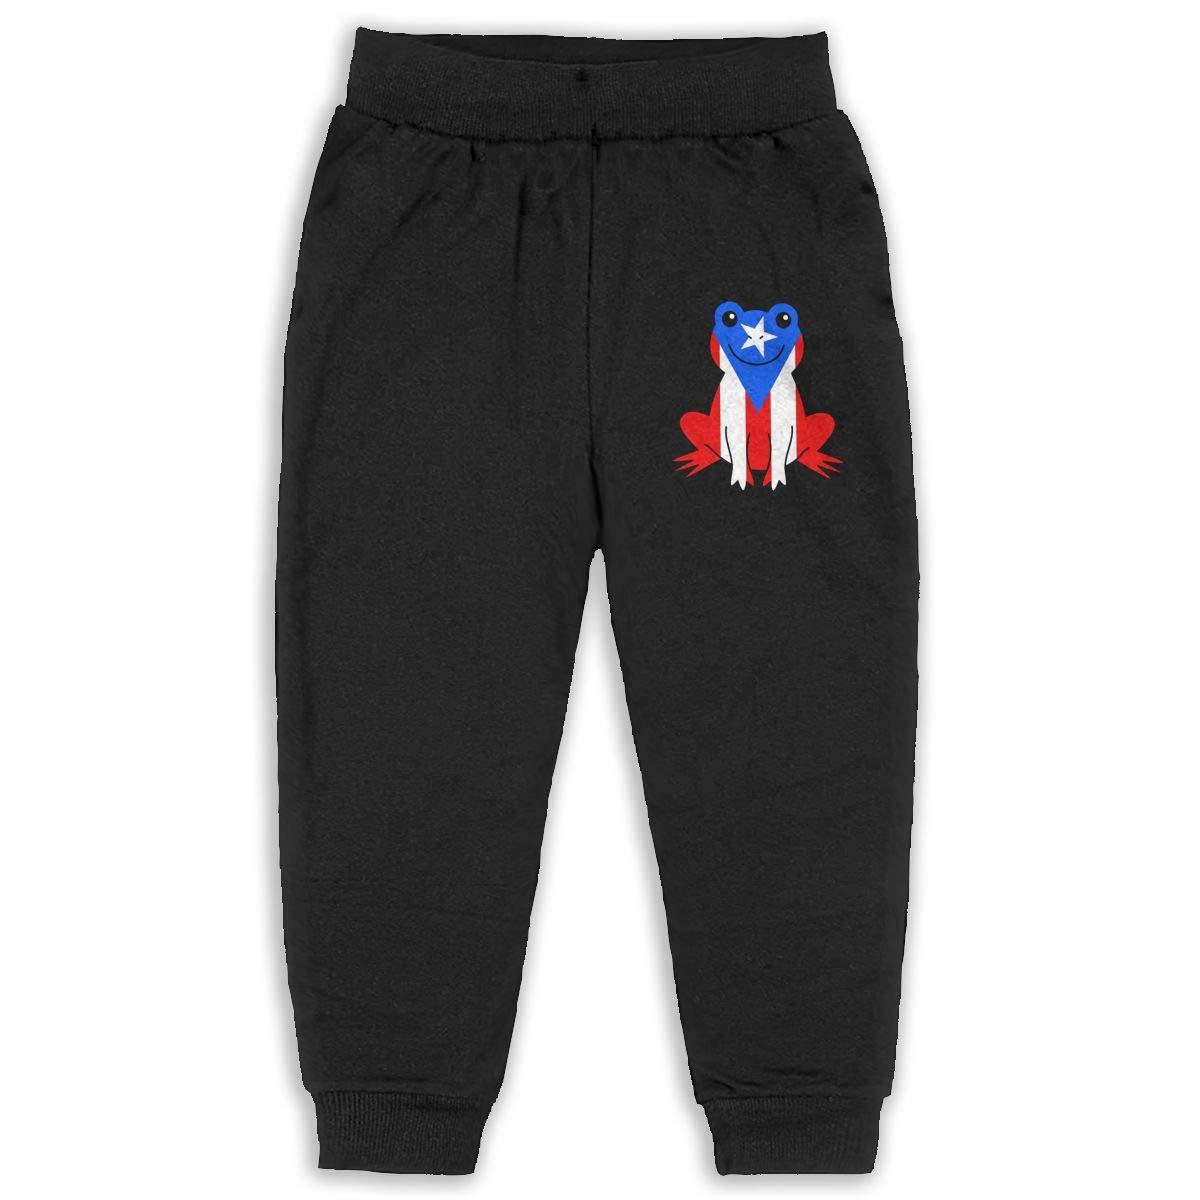 Kids Joggers Puerto Rico Frog Fashion Sweatpants 2T 6T